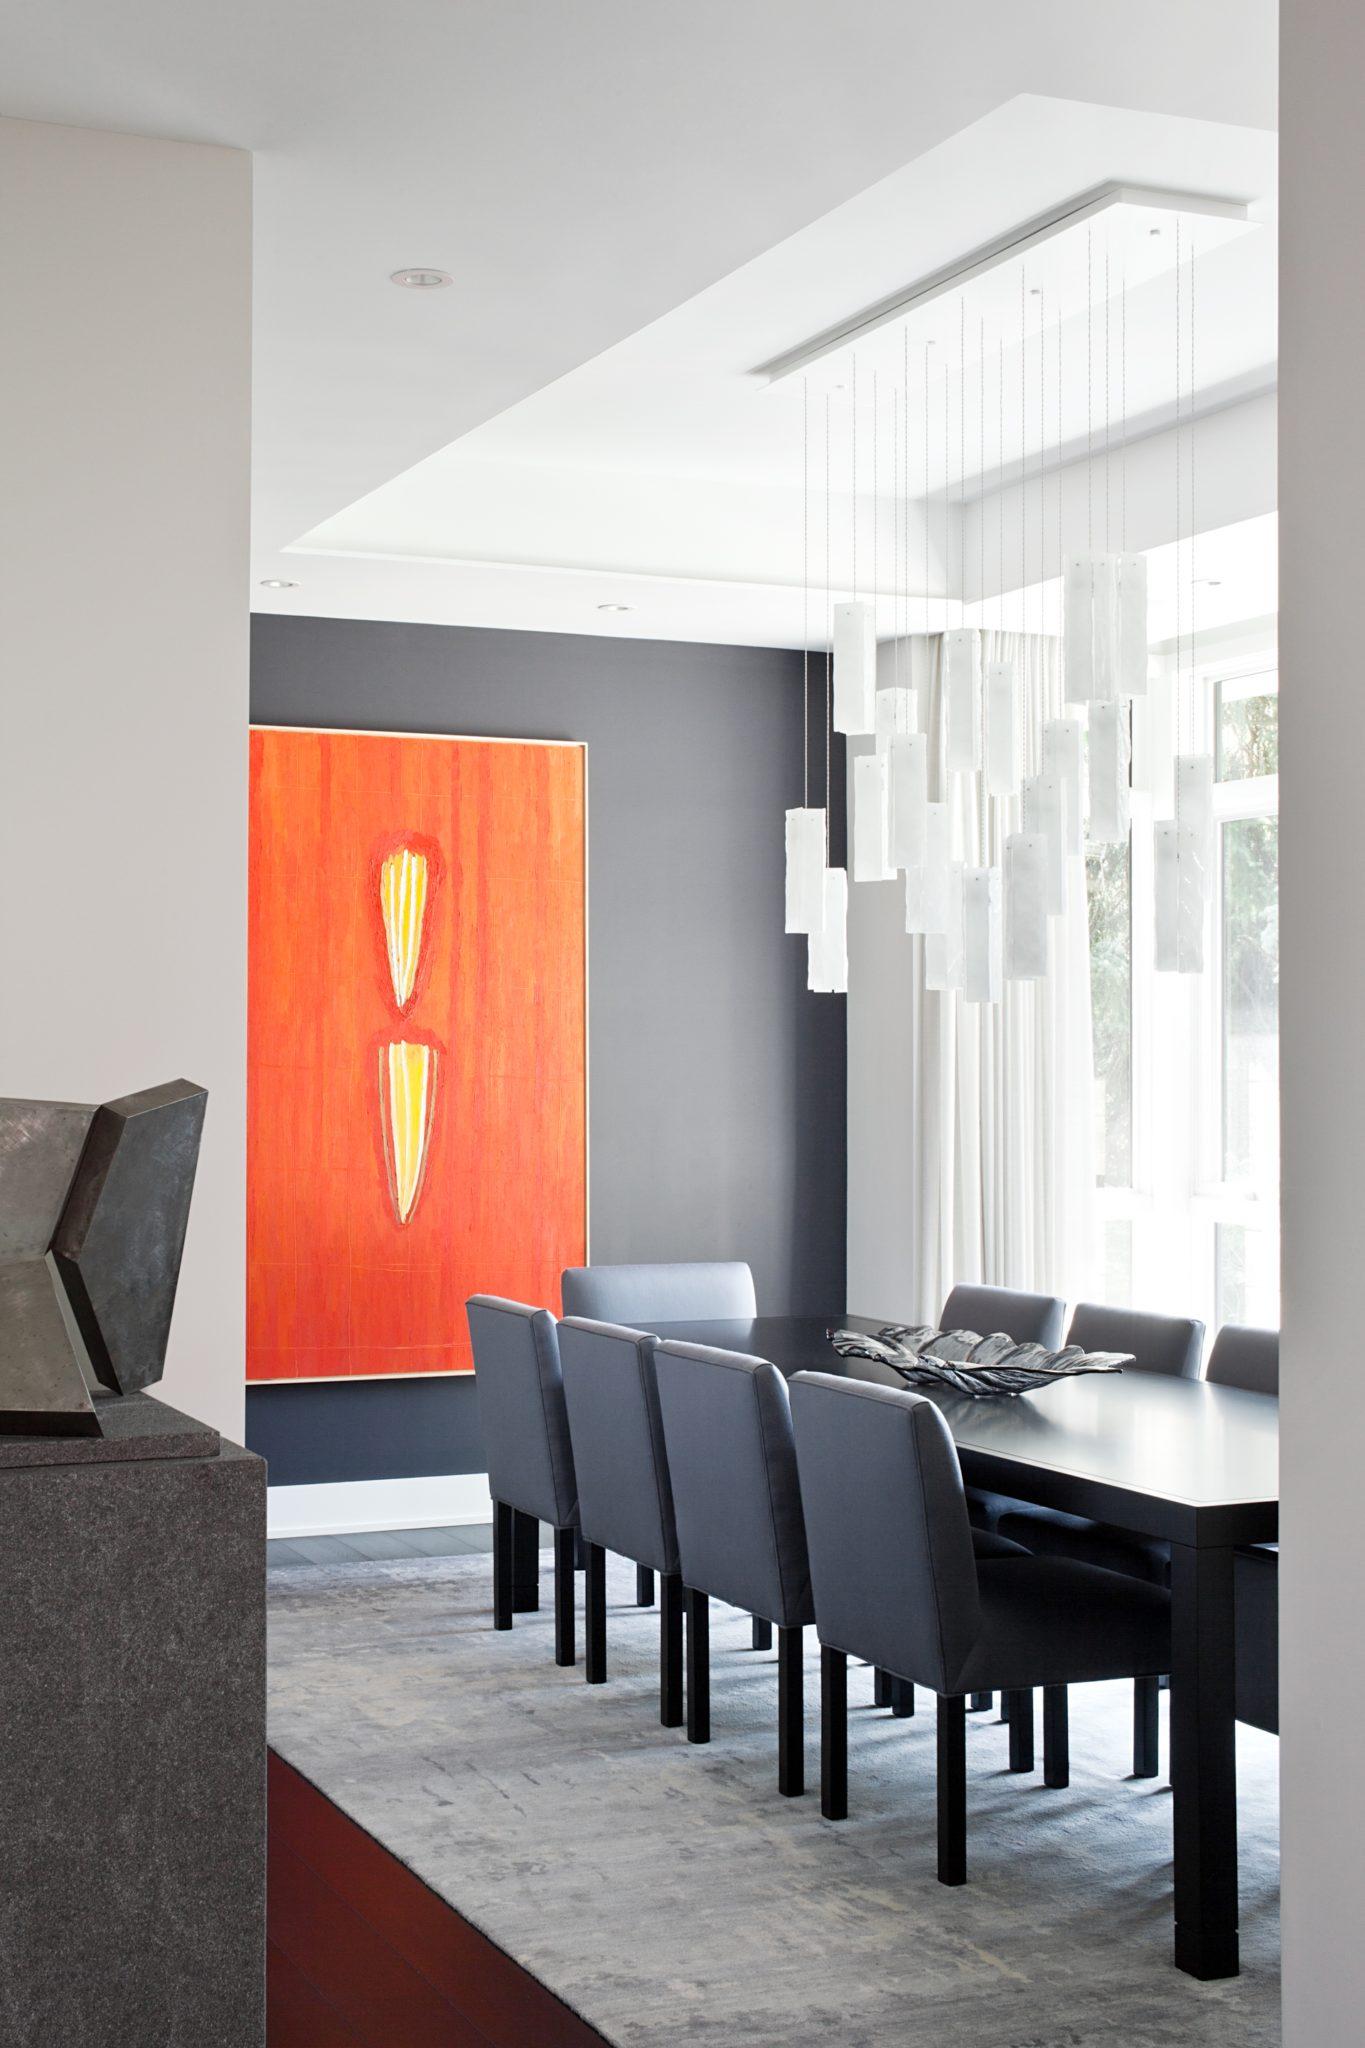 Edenbridge Humber Valley Home - Dining Room by Jennifer Worts Design